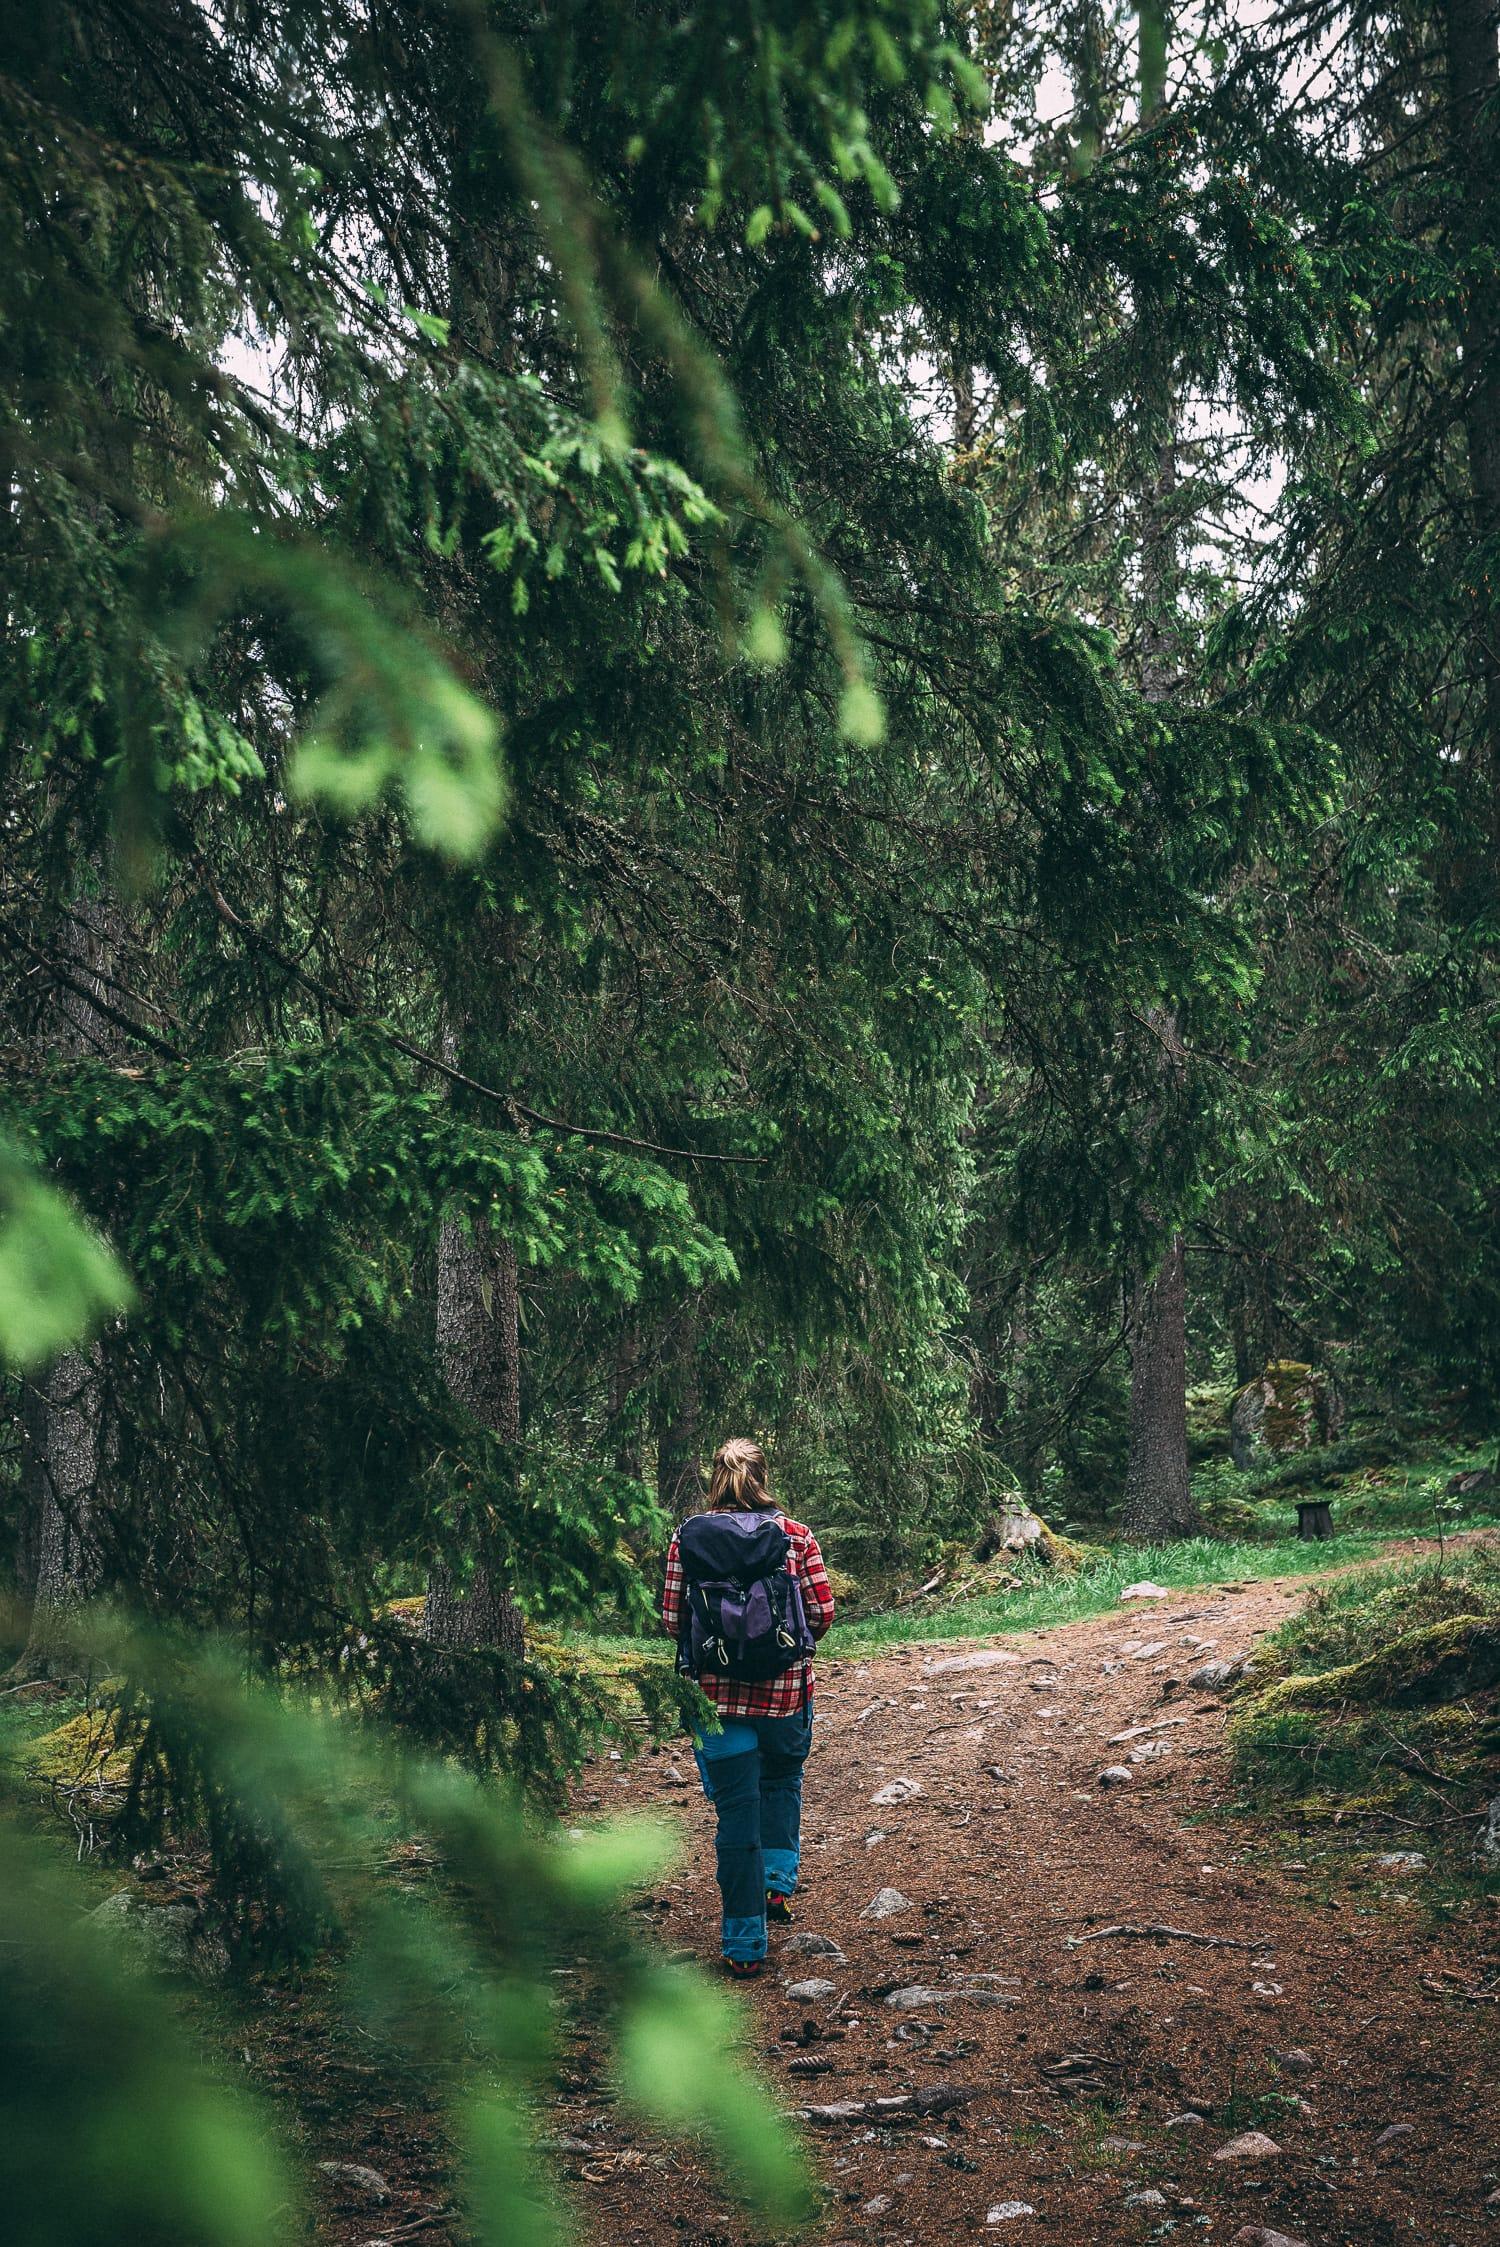 Hiking up to Ärteråsens Fäbodar